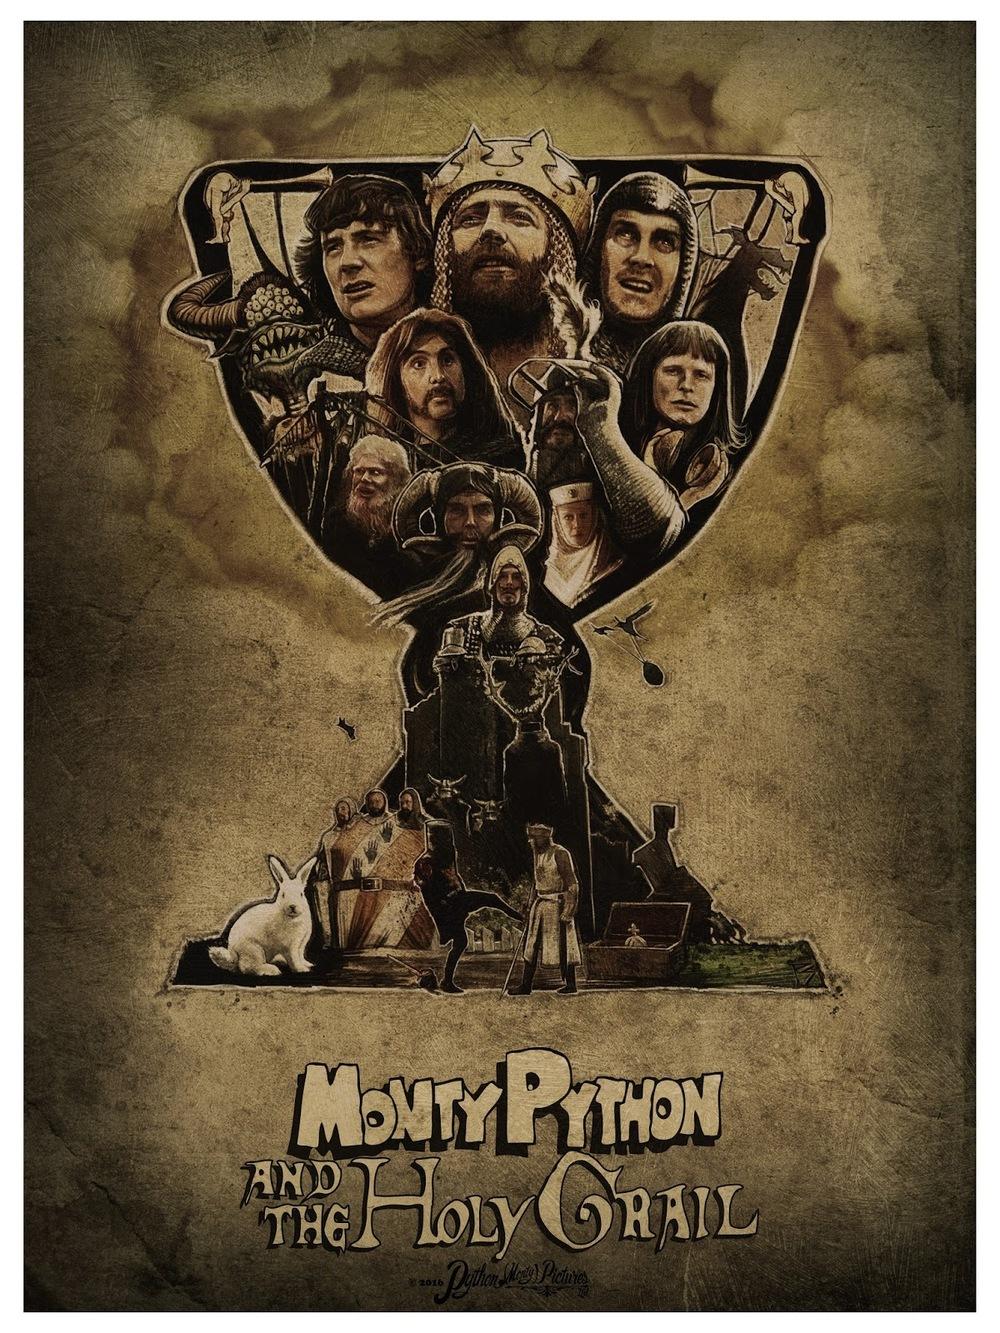 Paul-Shipper-Monty-Python-Holy-Grail-VARIANT-Print.jpg